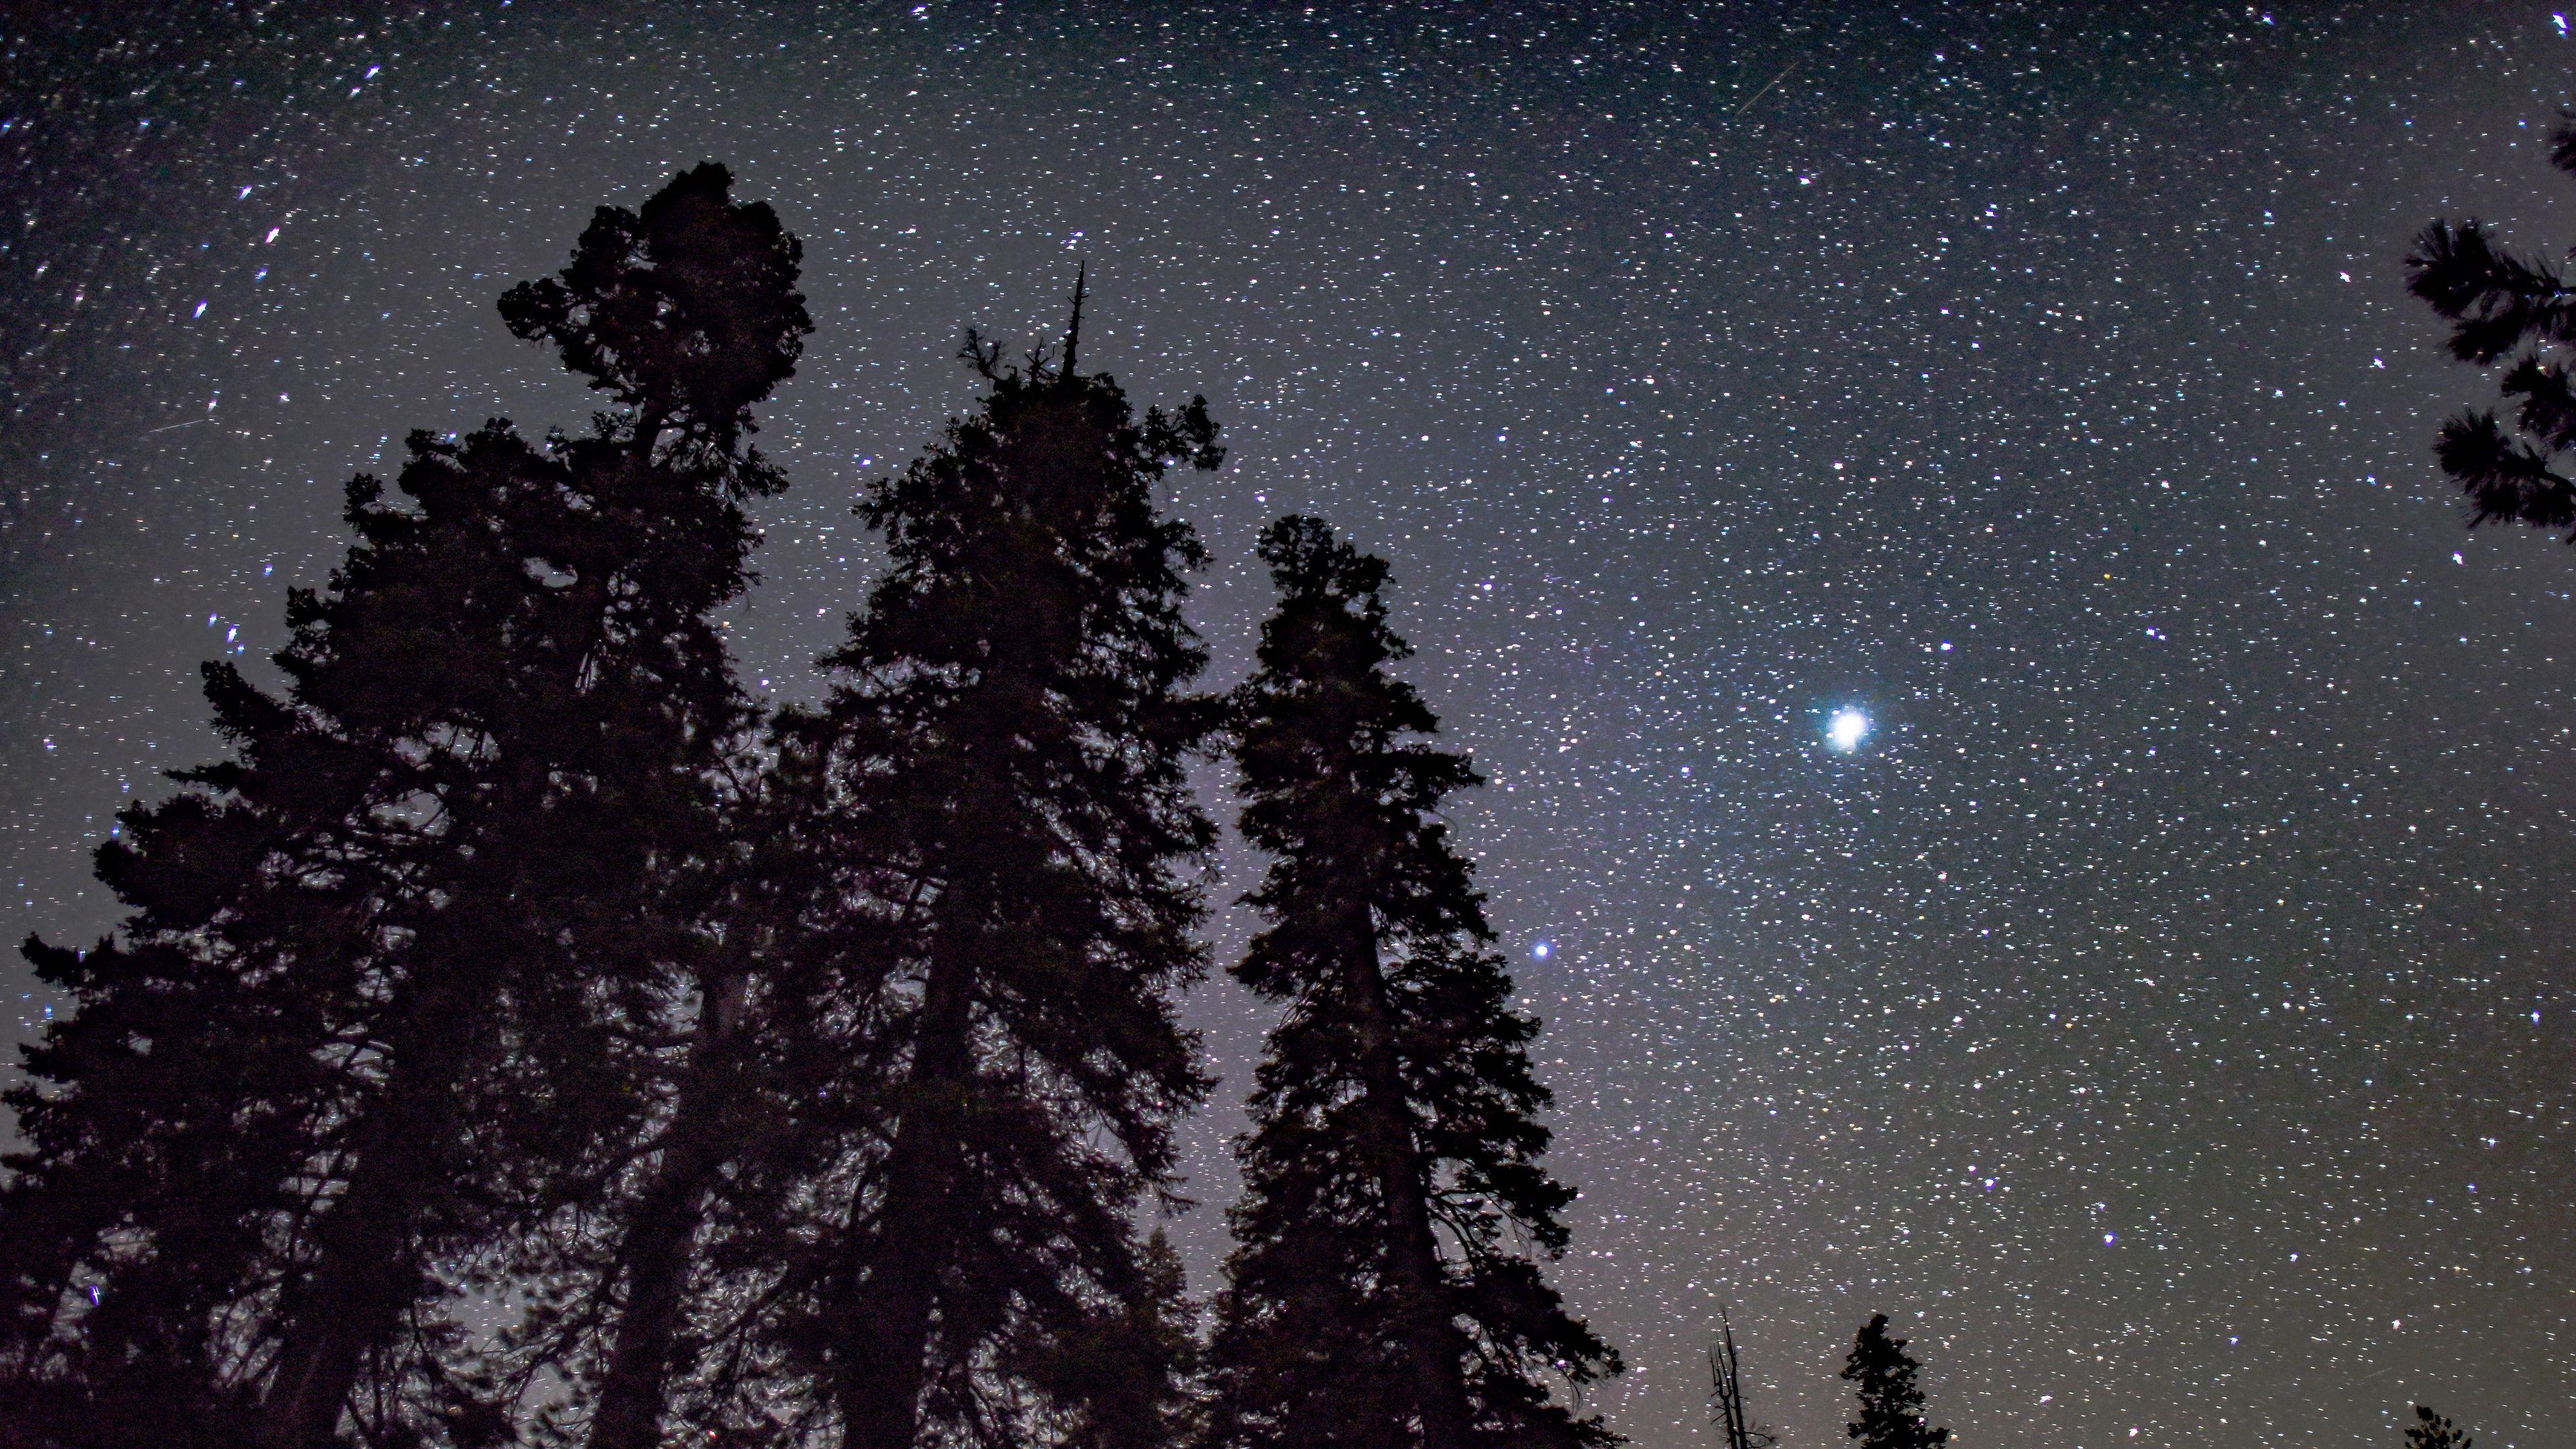 Wallpaper 4k starry sky, trees, night, stars, glitter